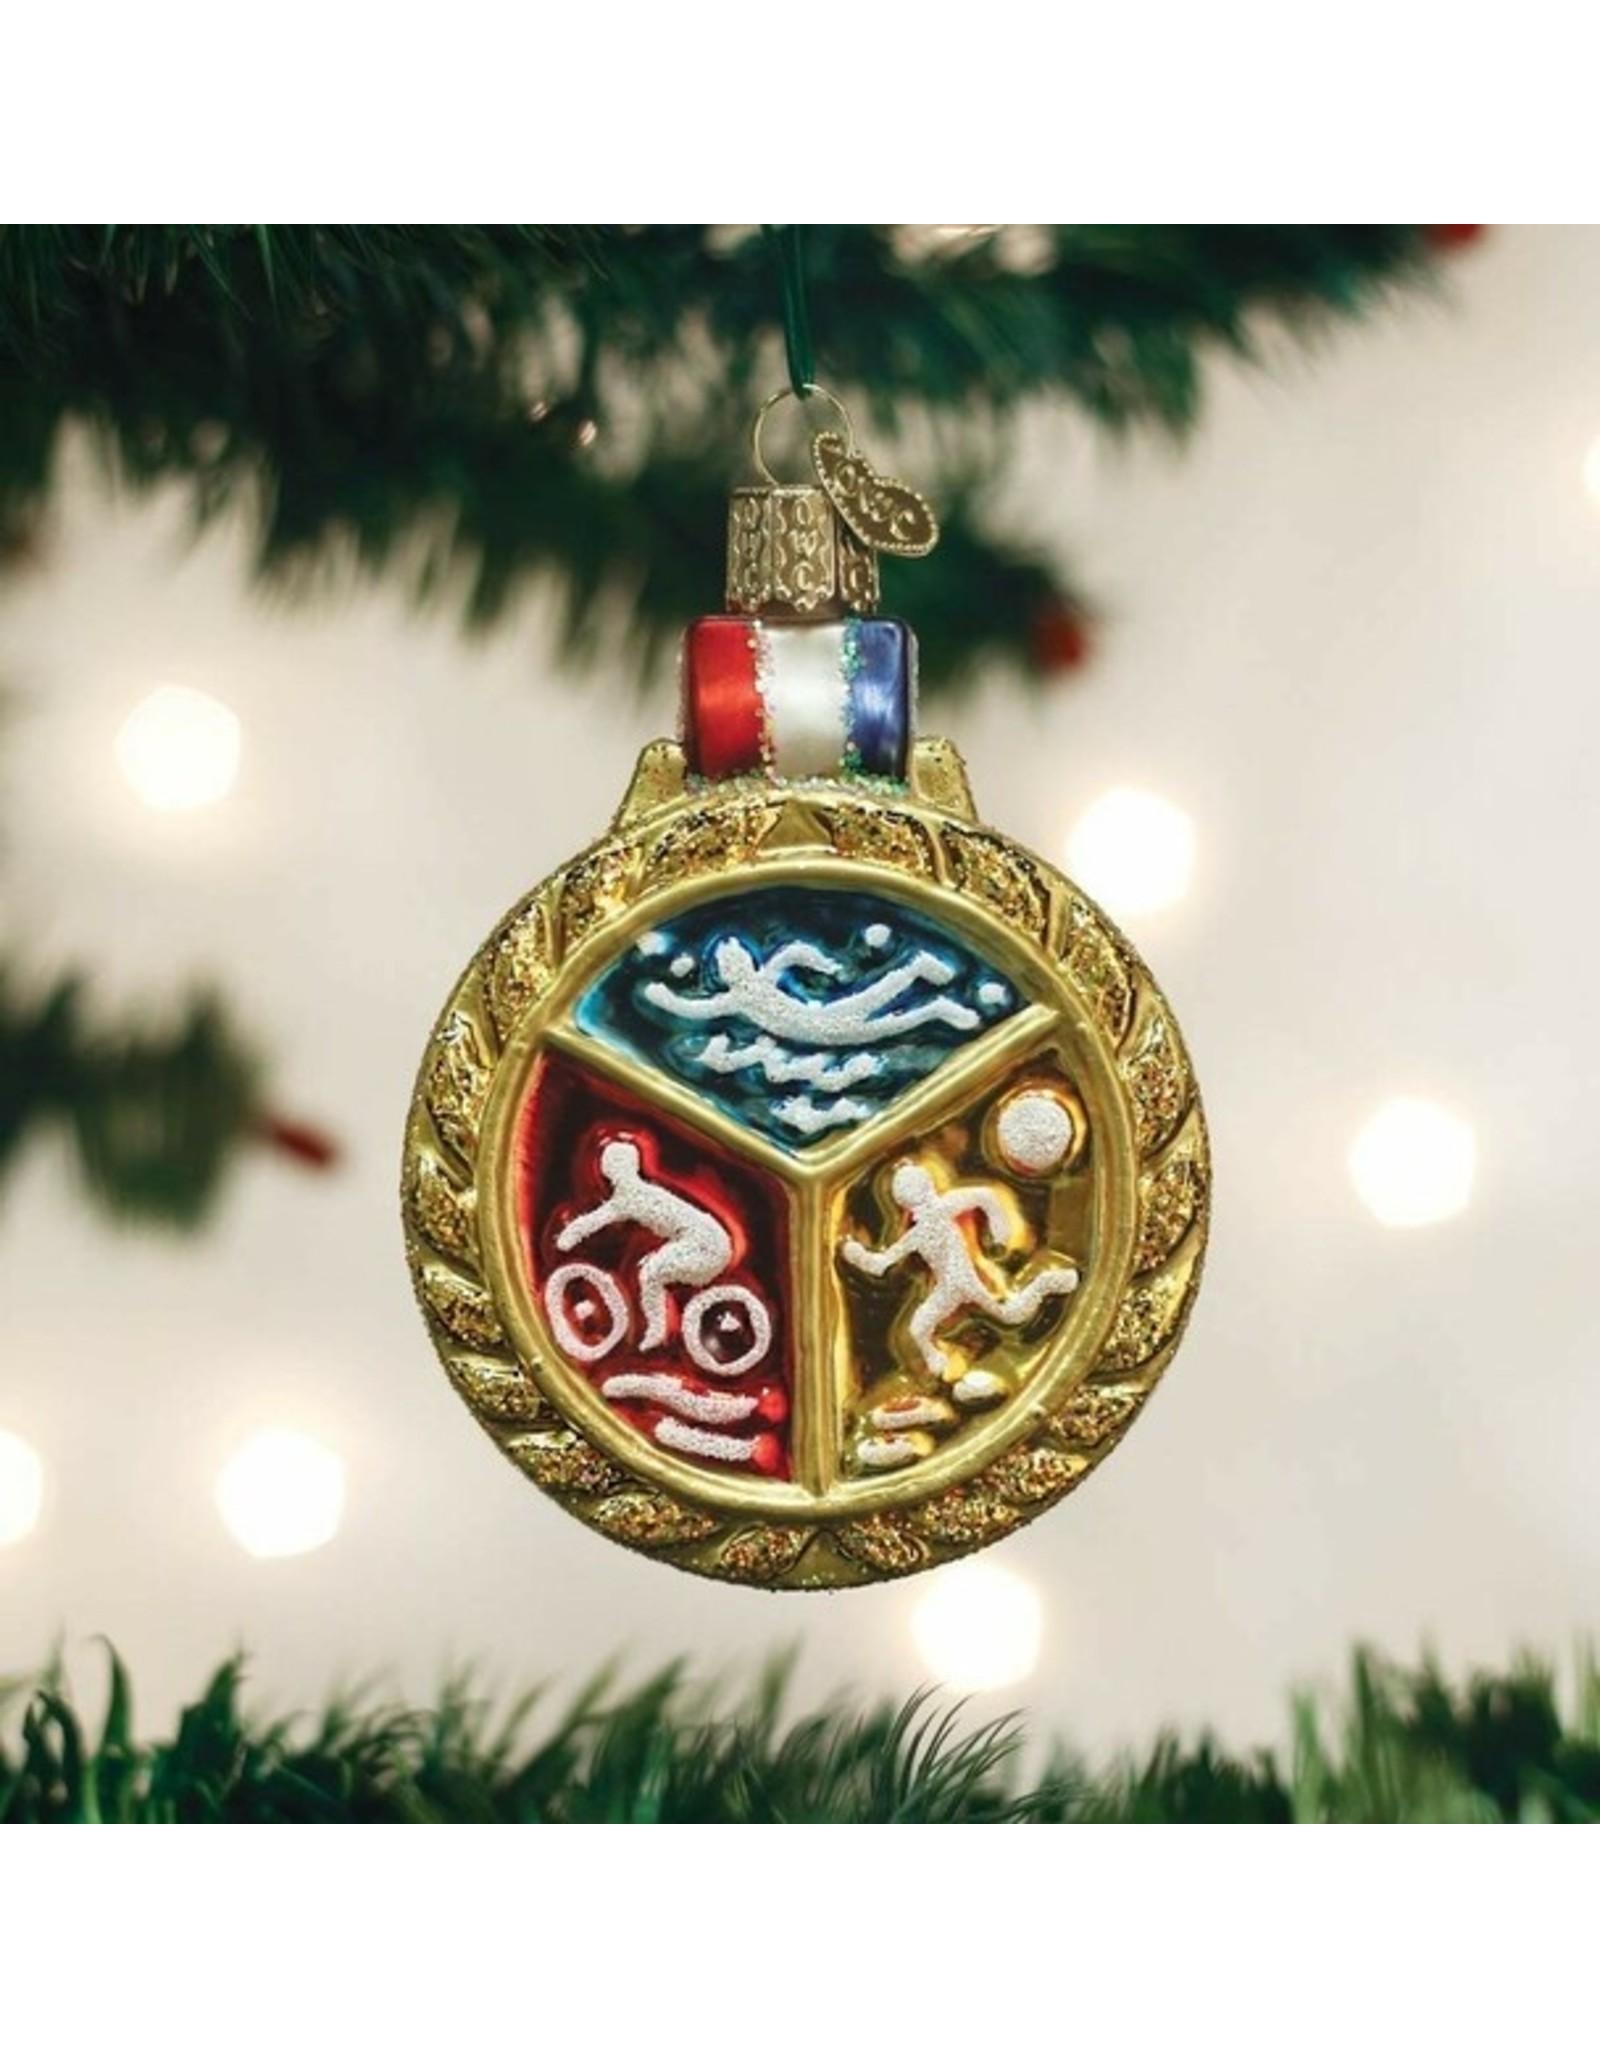 Old World Christmas Triathlon Medallion Ornament